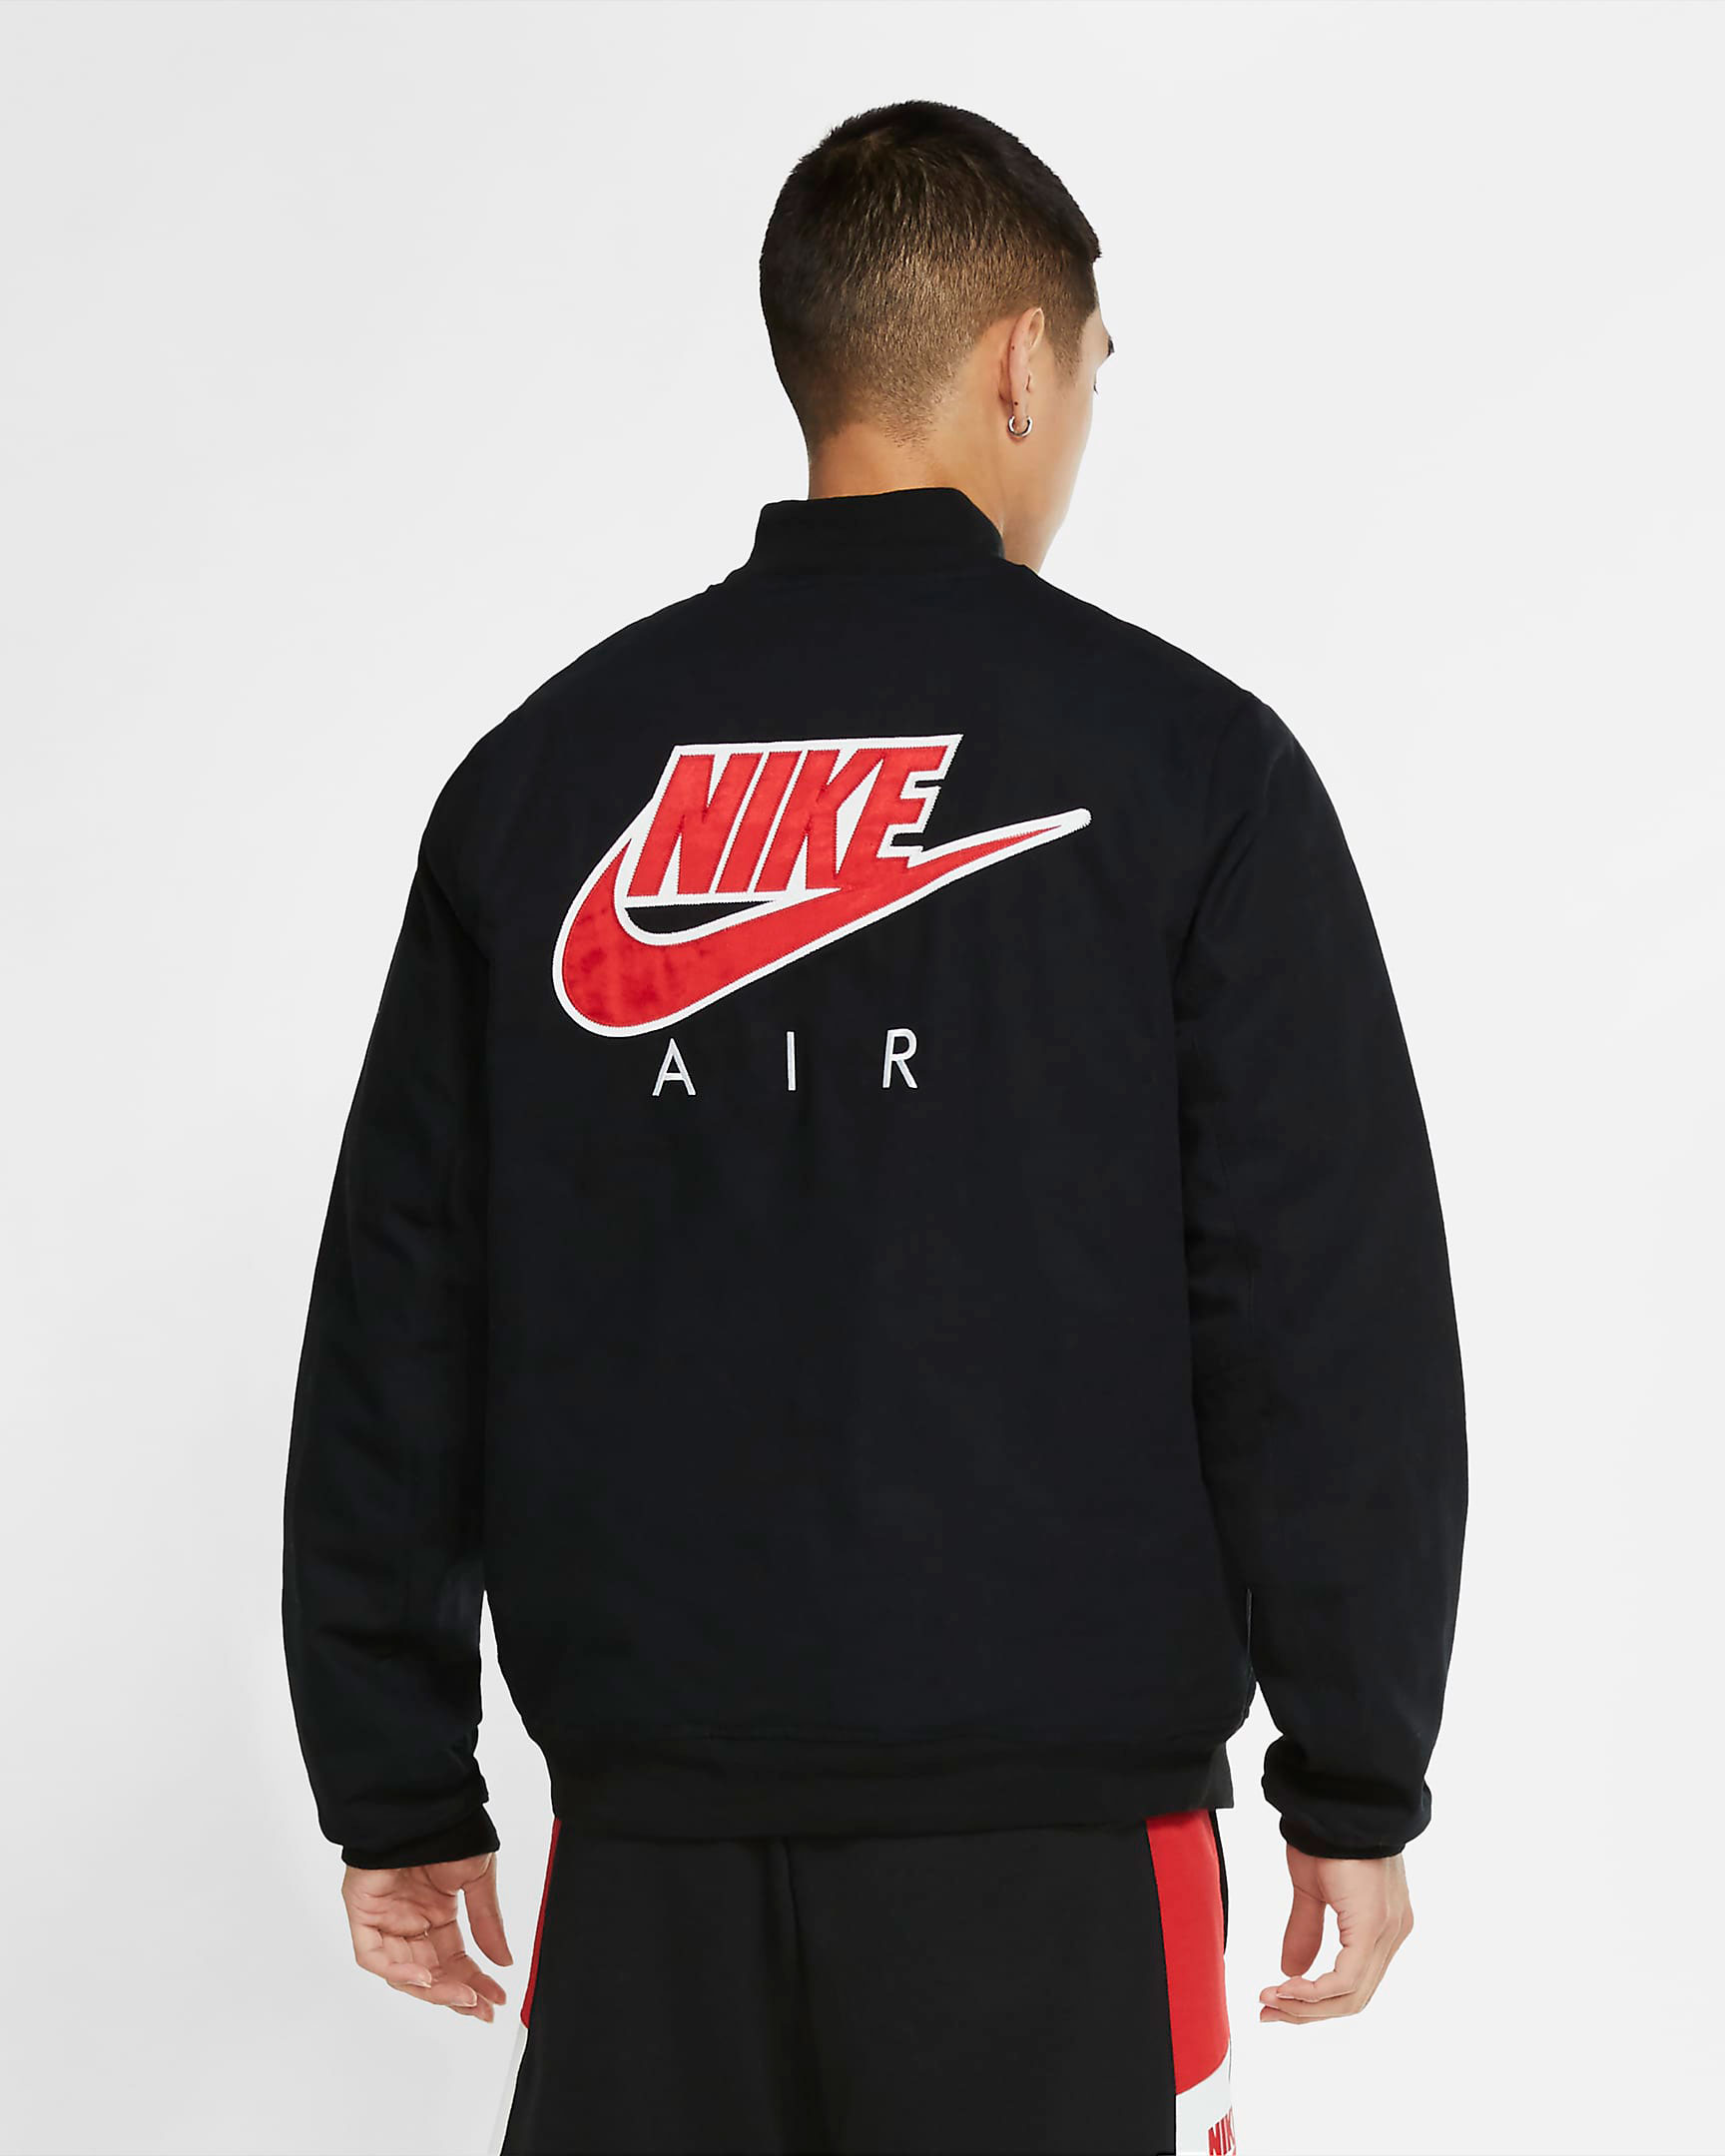 air-jordan-3-denim-fire-red-japan-jacket-2